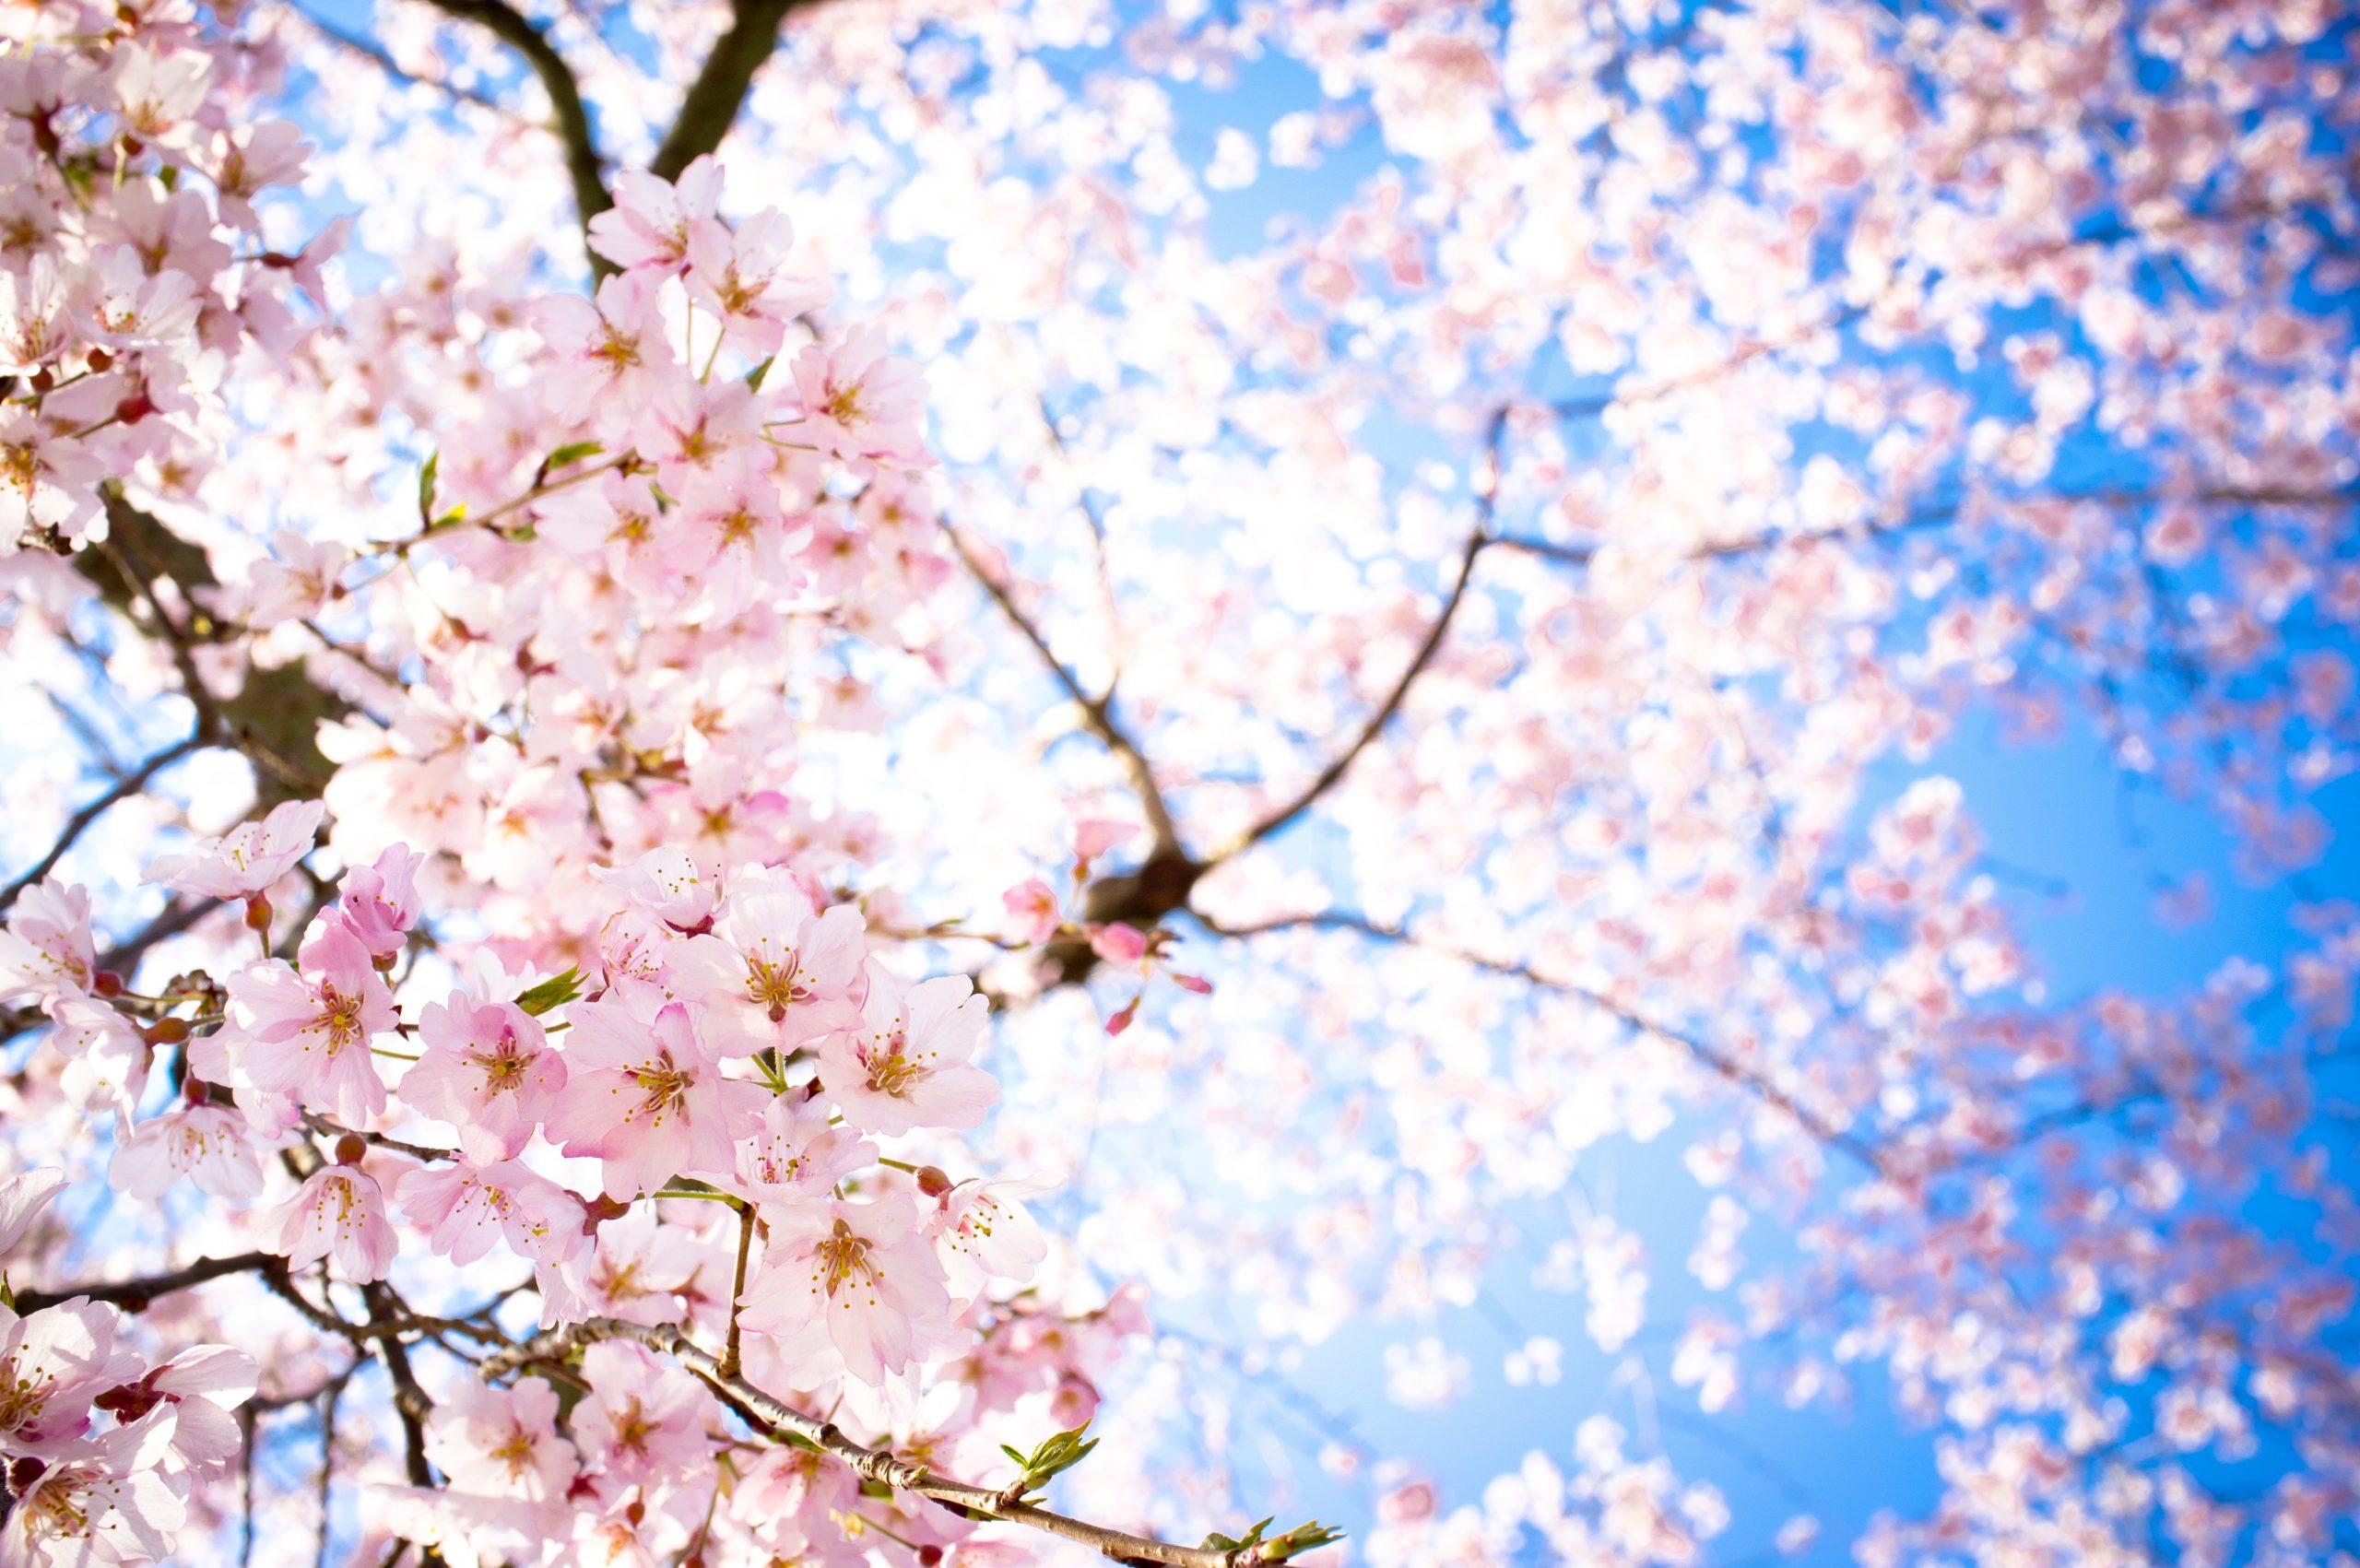 Giappone a Roma - I sakura, ciliegi giapponesi - ©freetopwallpaper.com